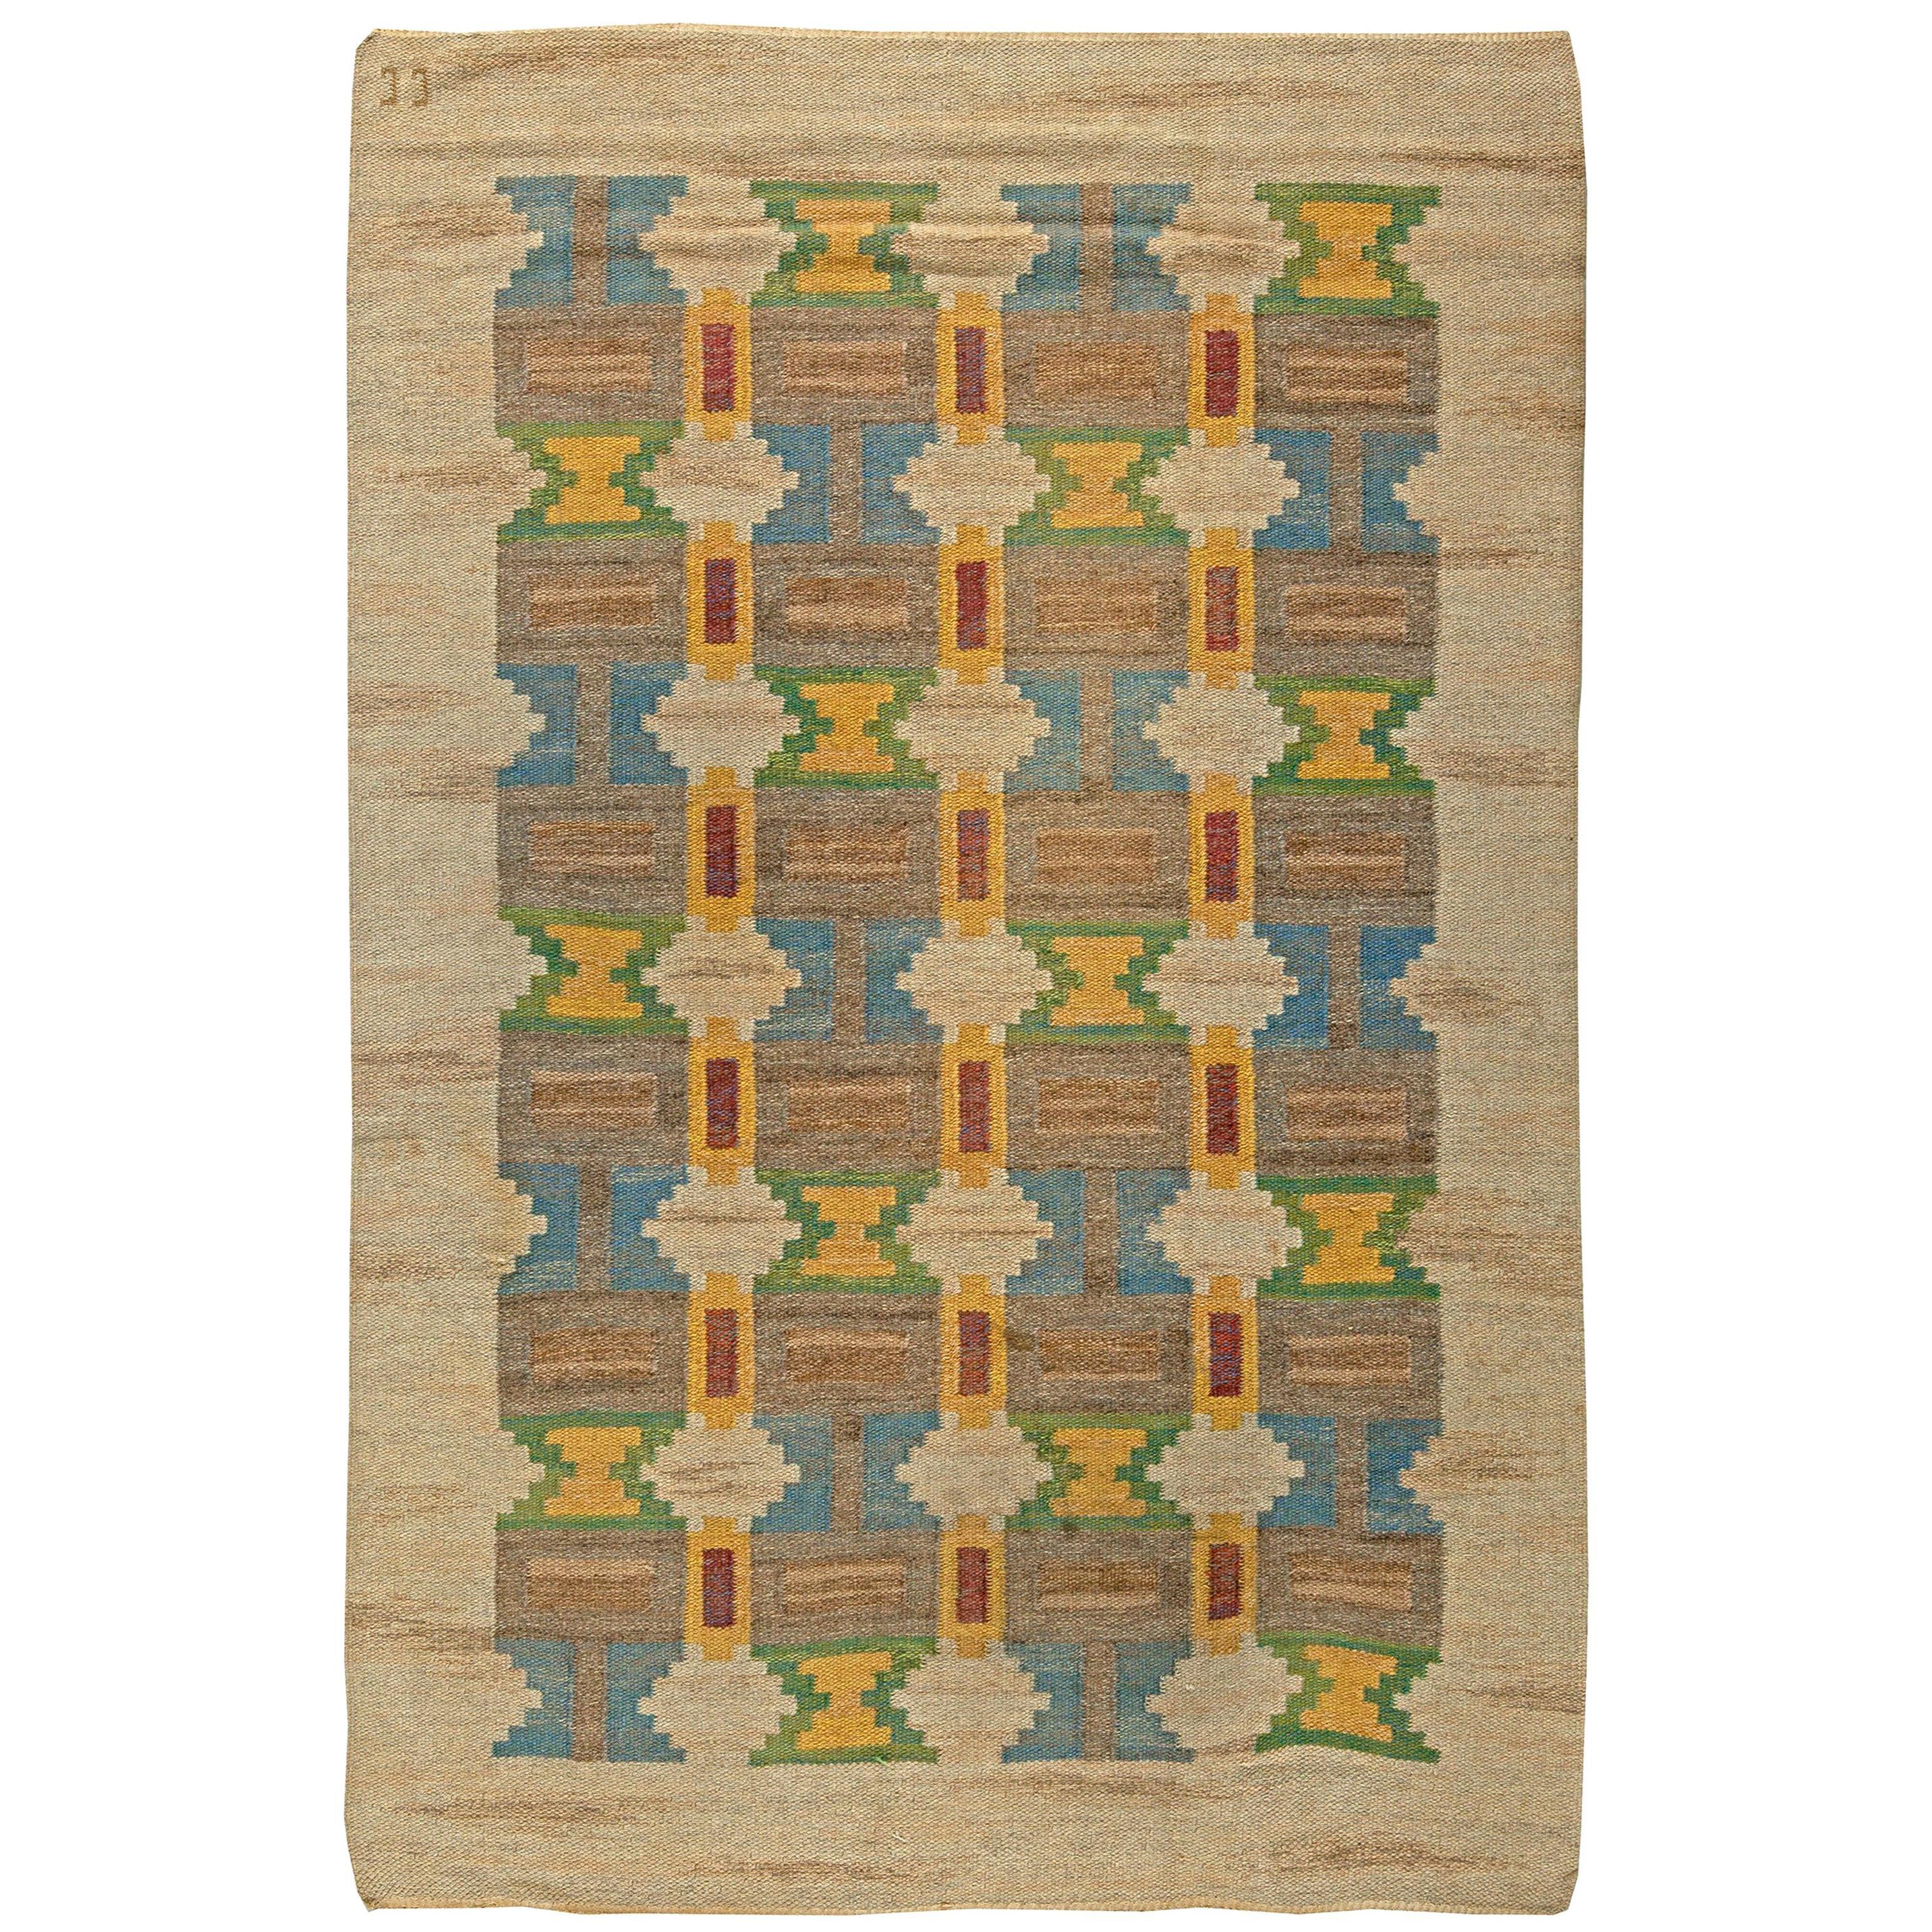 Midcentury Swedish Geometric Handmade Rug by Judith Johansson